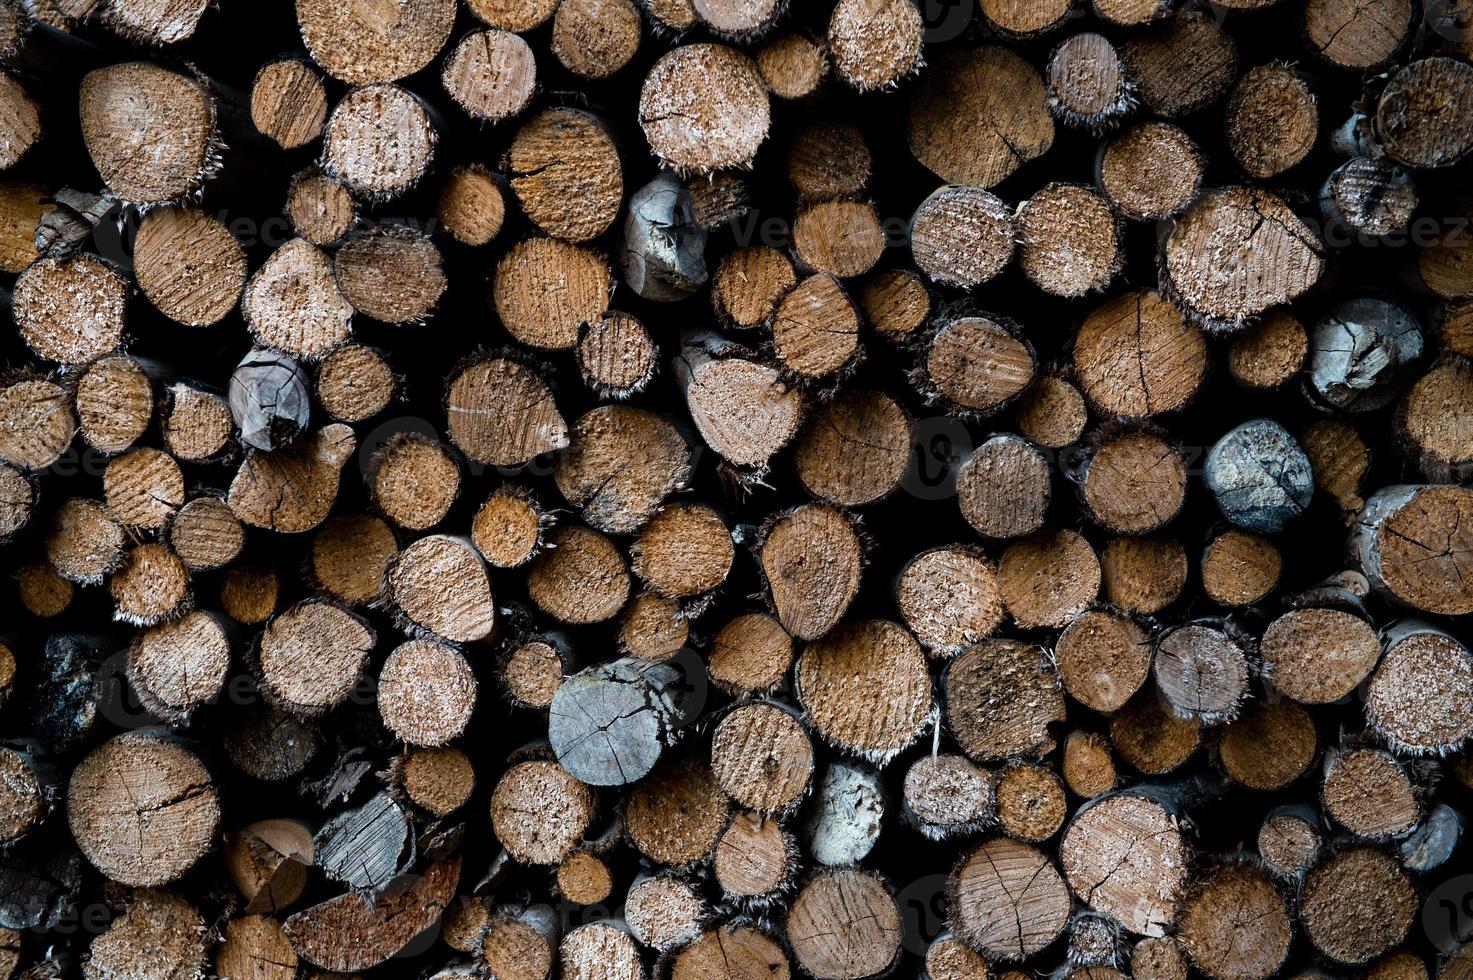 troncos de árboles apilados foto